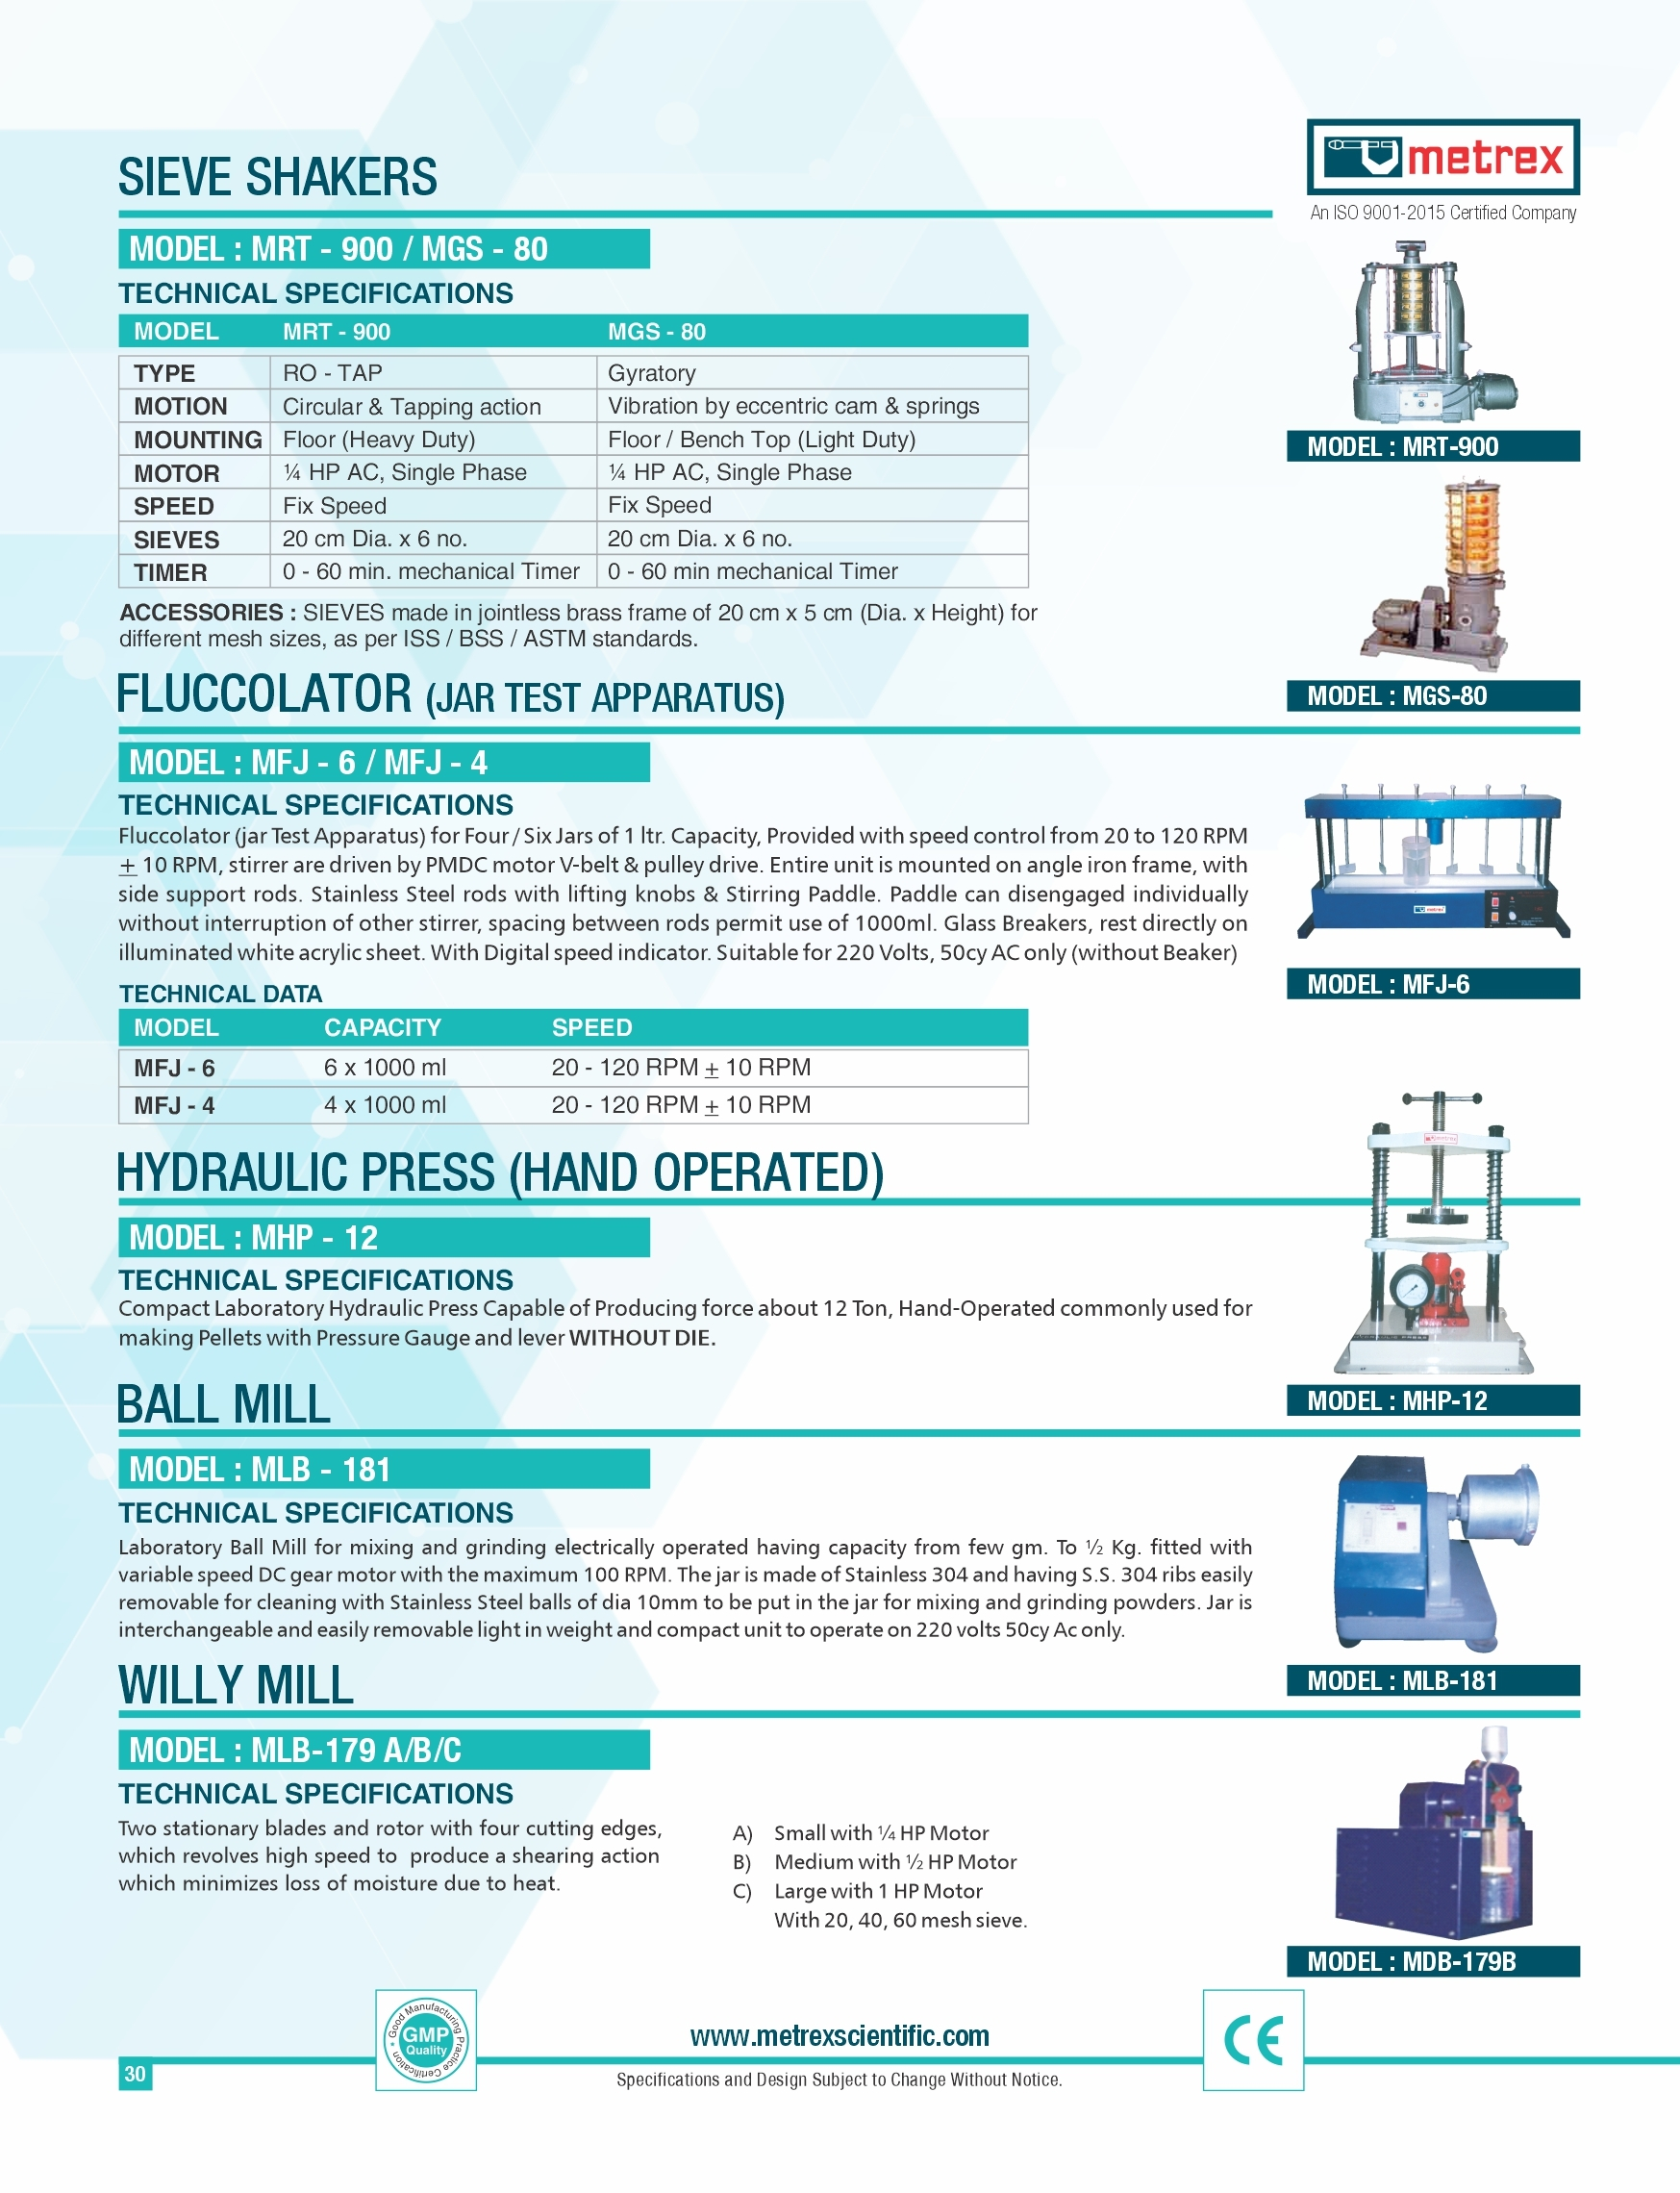 Fluccolator ( Jar Test Apparatus )